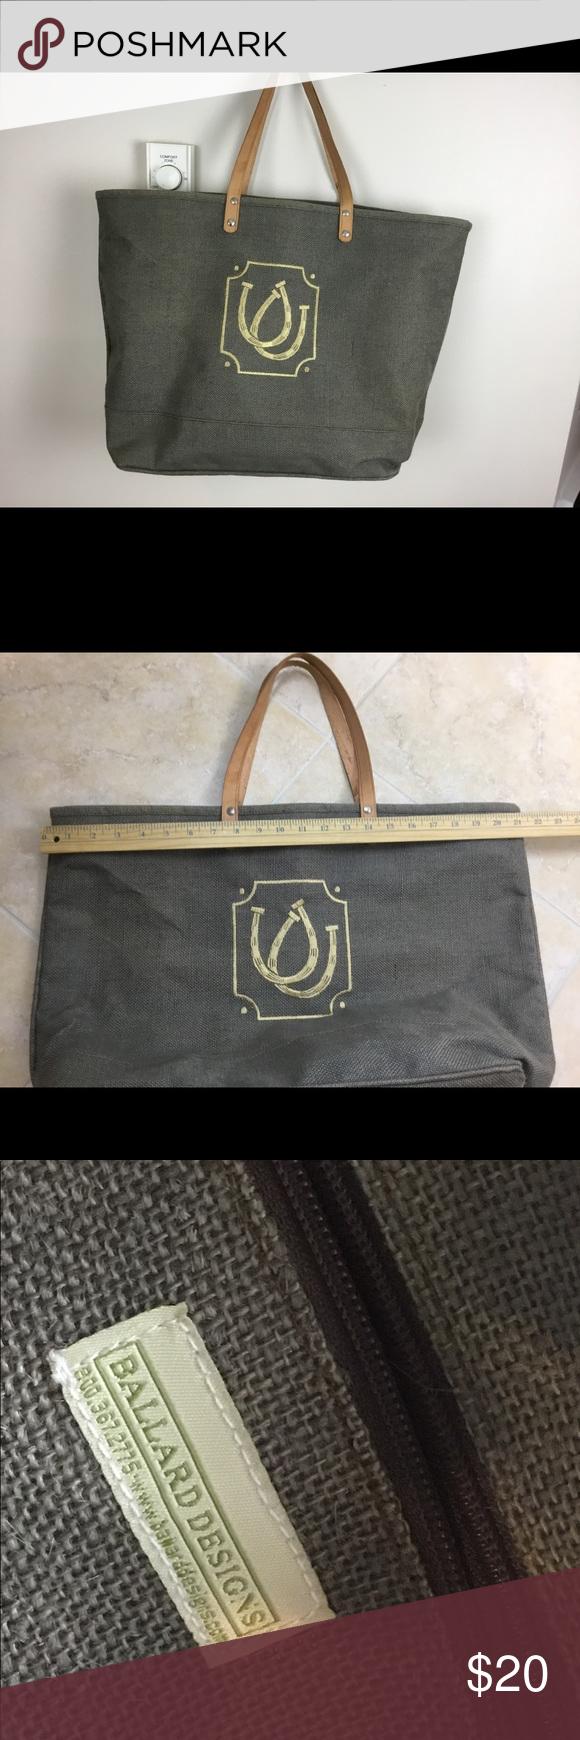 ballard design jute horseshoes jute tote beach bag excellent